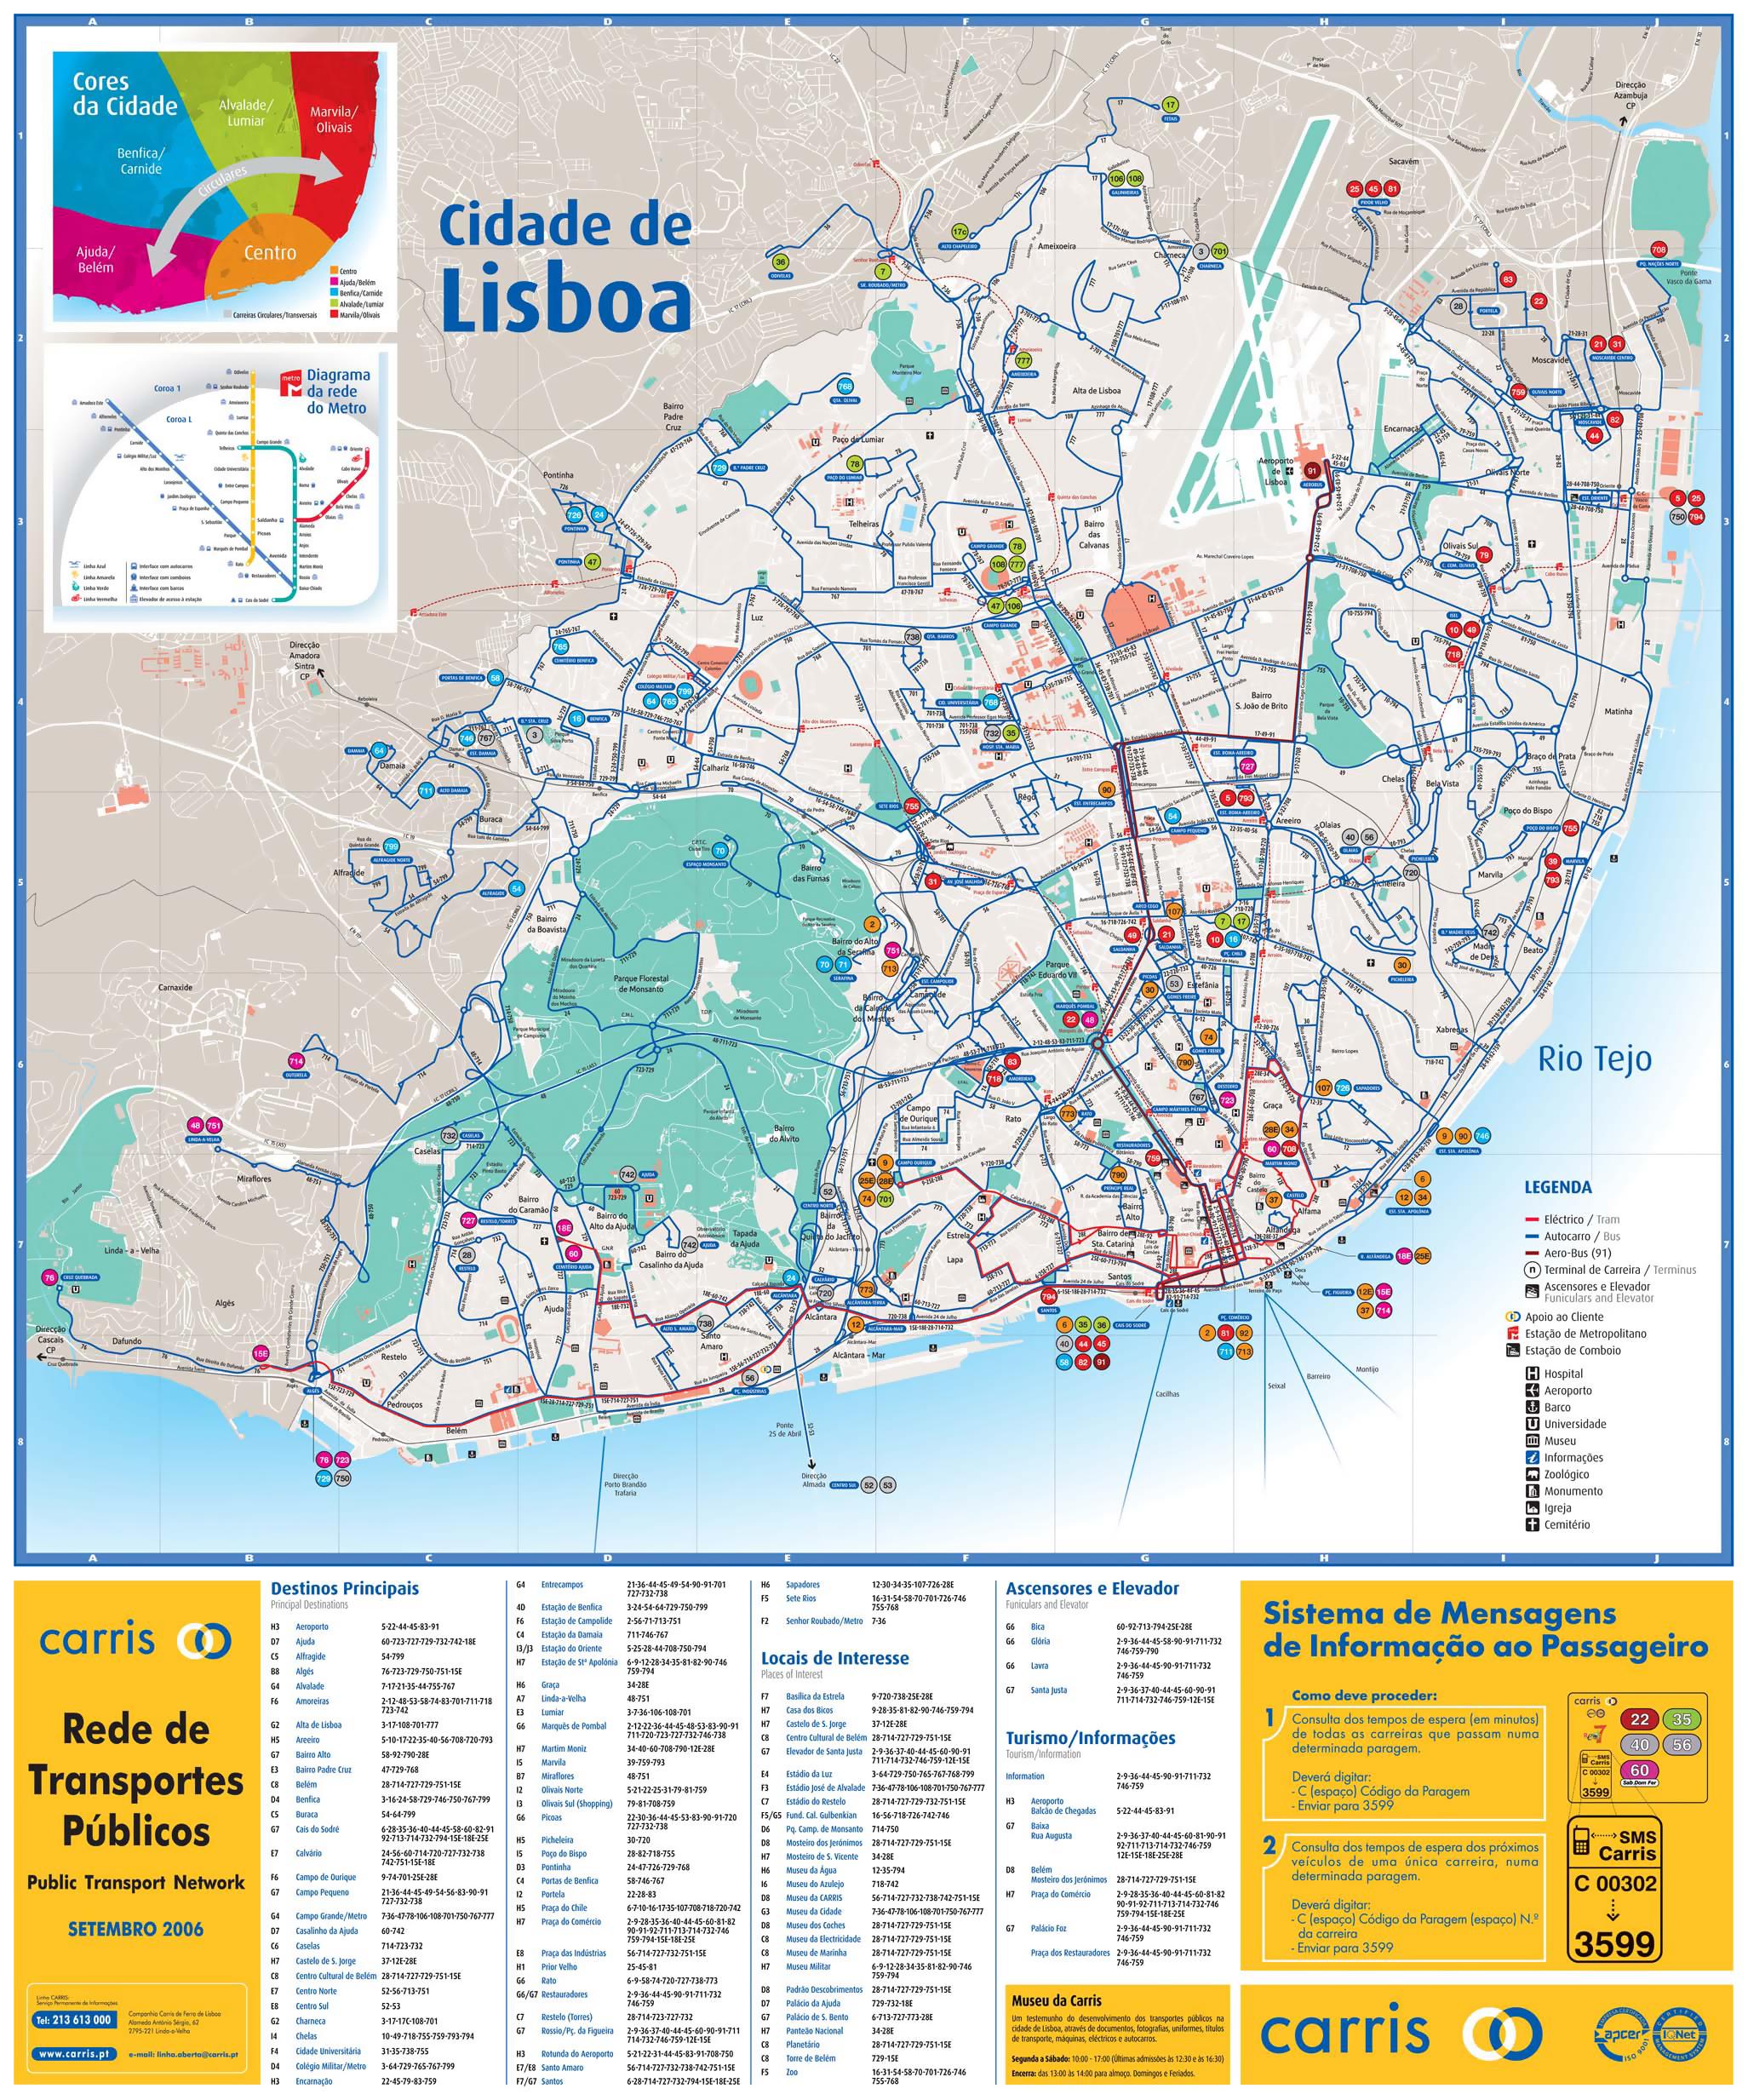 Large public transport map of Lisbon city Vidianicom Maps of